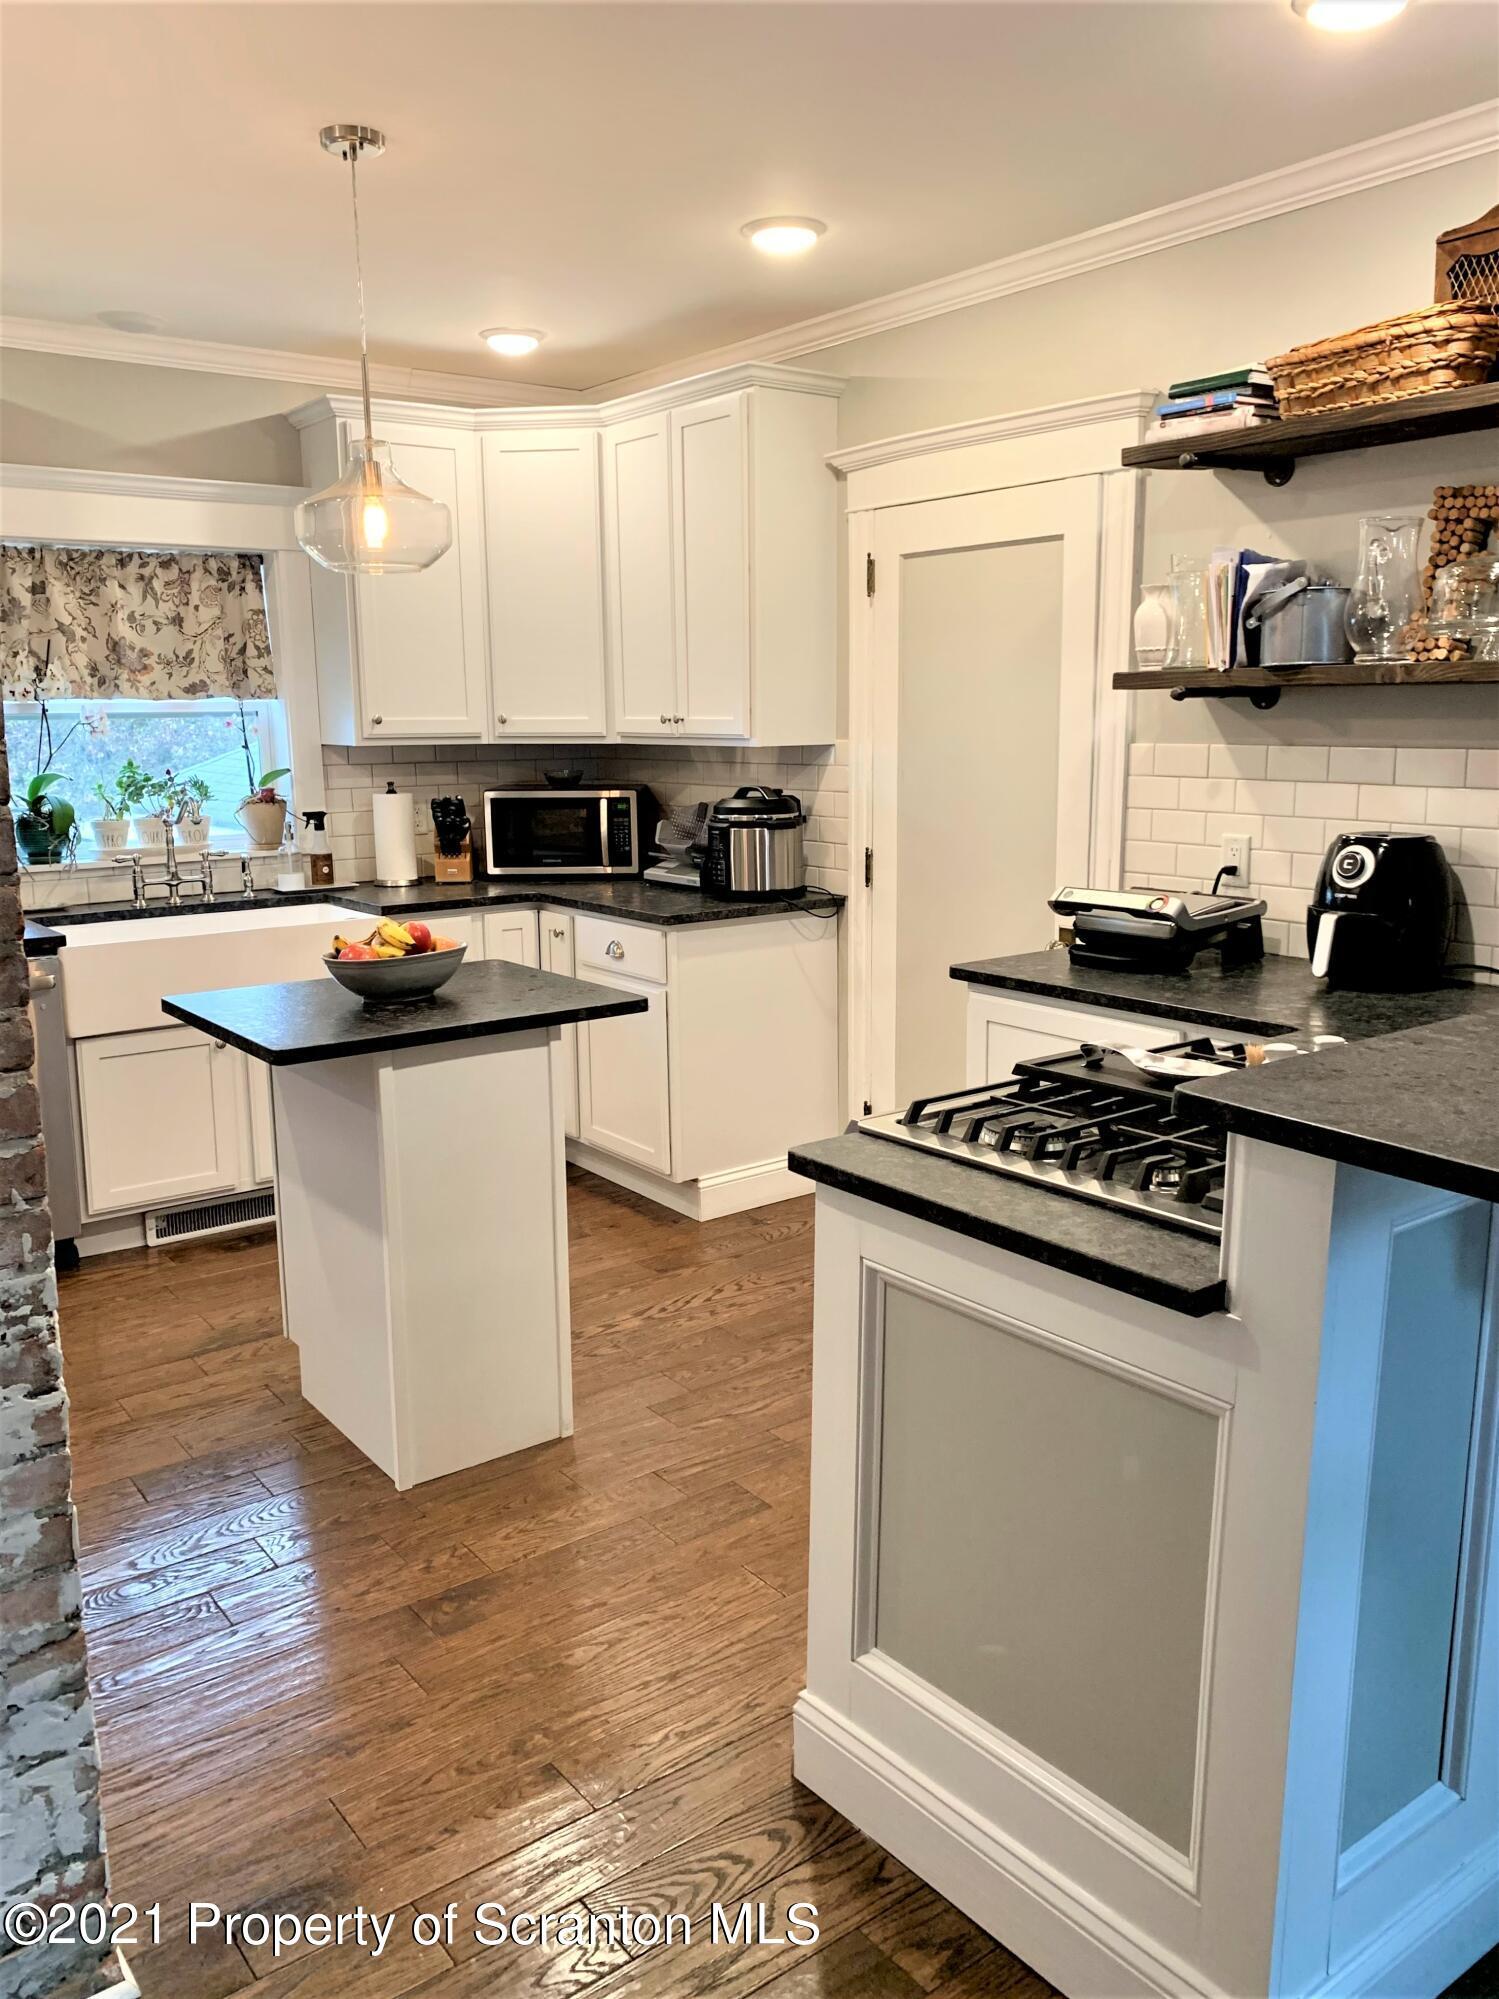 34 Clark Ave, Carbondale, Pennsylvania 18407, 3 Bedrooms Bedrooms, 7 Rooms Rooms,2 BathroomsBathrooms,Single Family,For Sale,Clark,21-1635